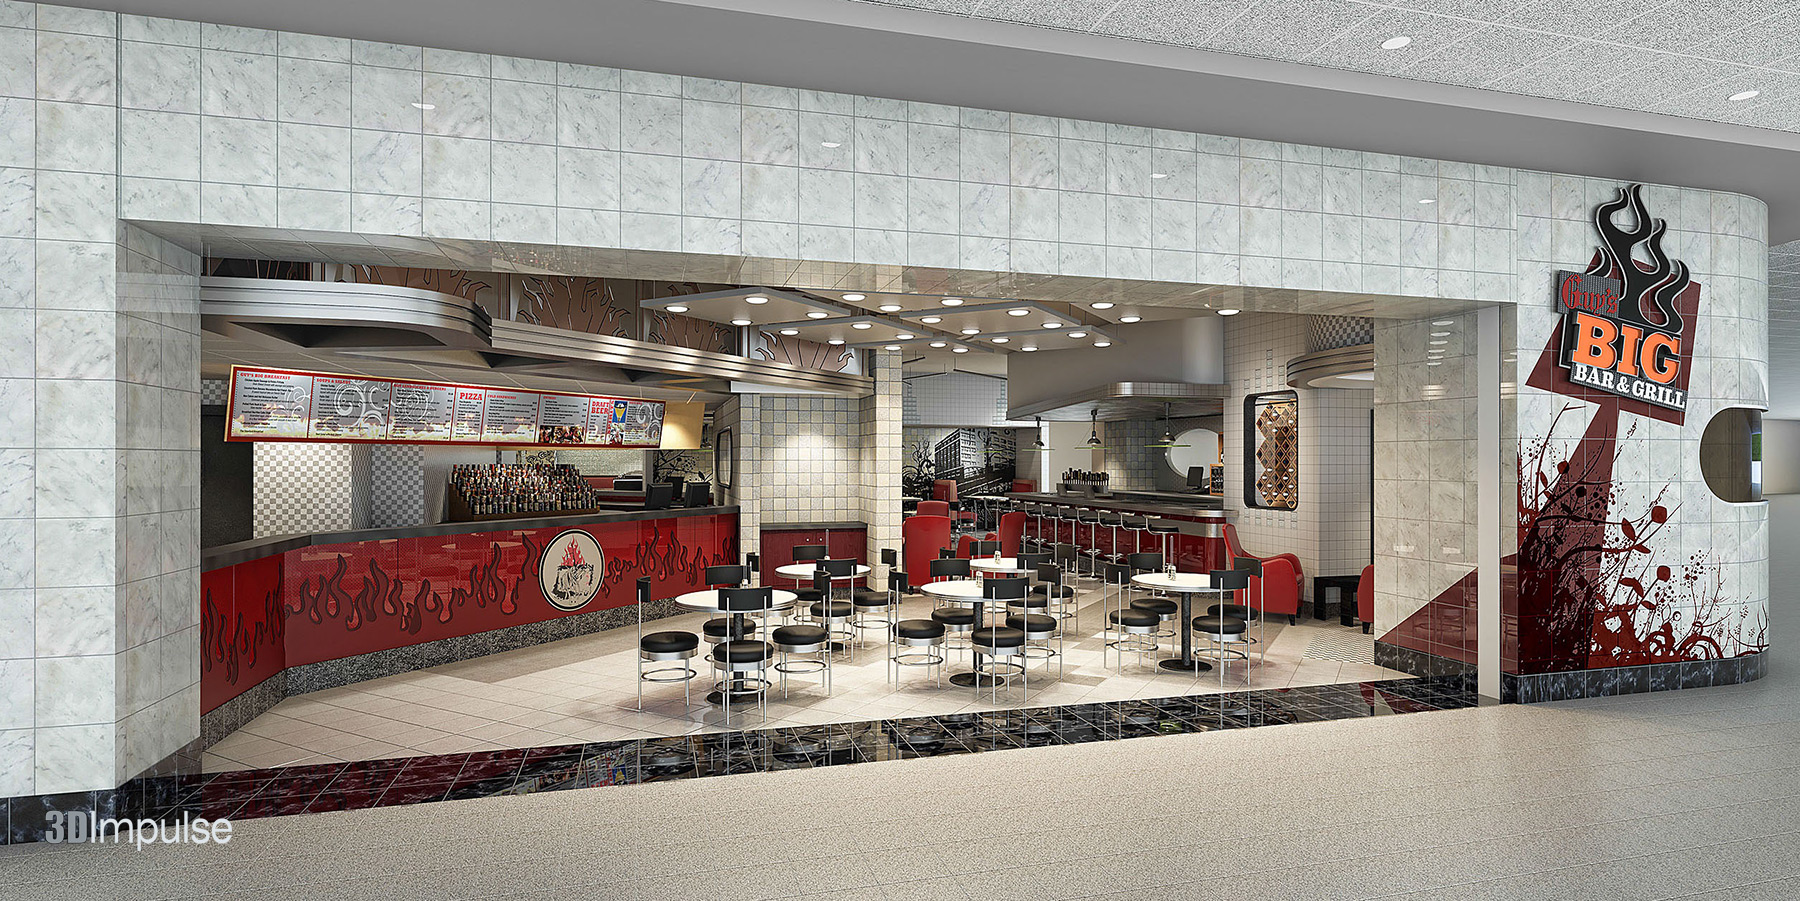 Airport Restaurant Diner Storefront 3d Impulse